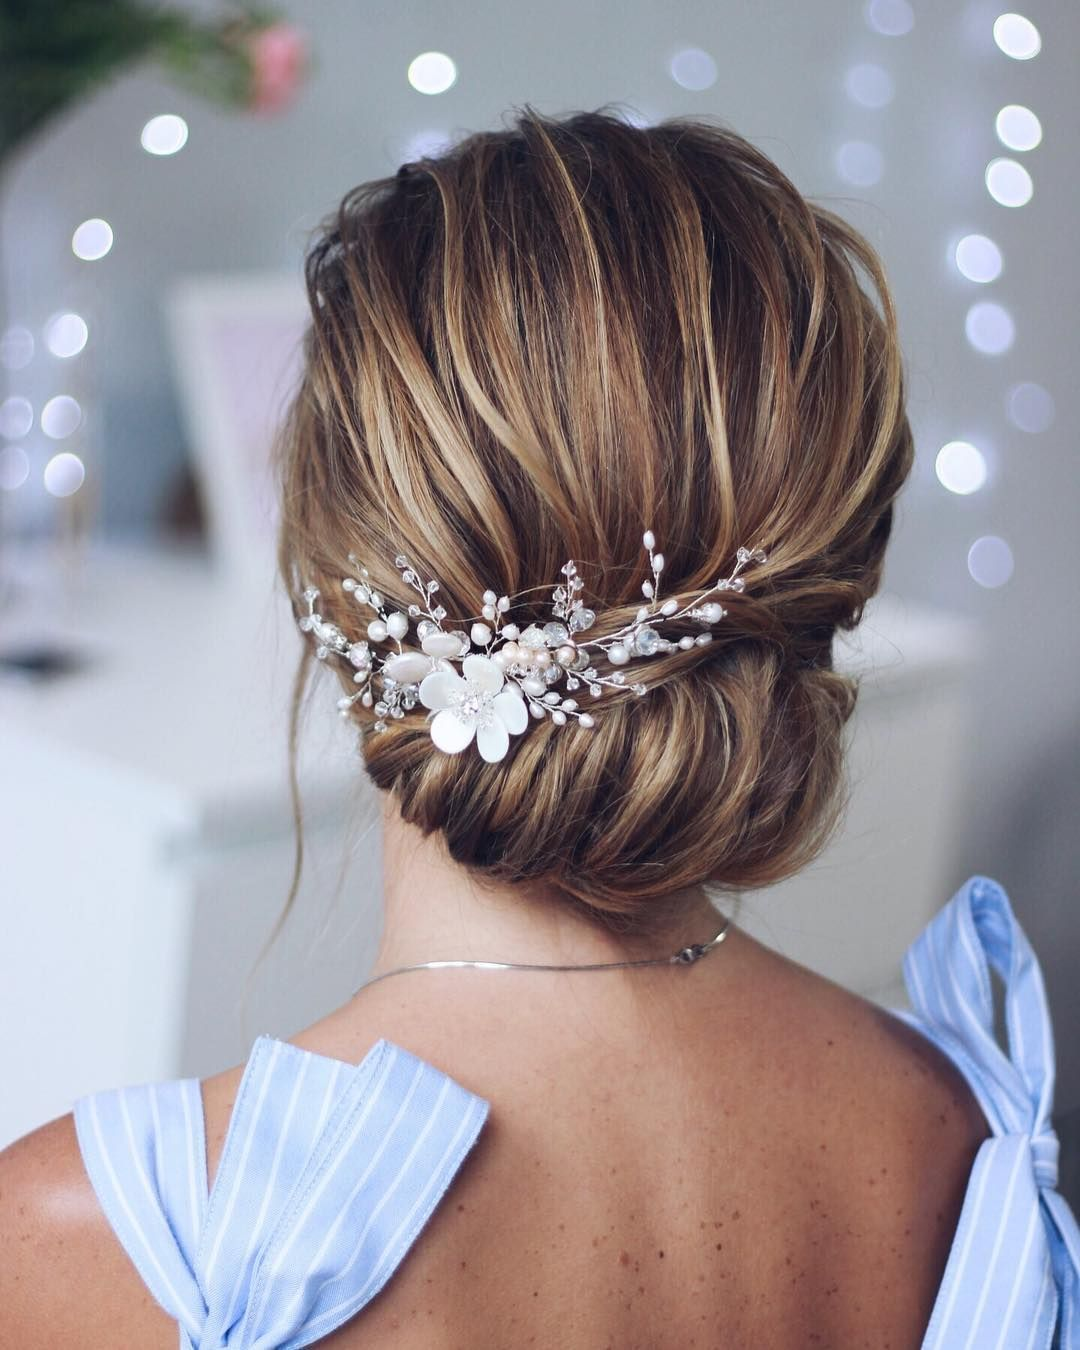 Simple beautiful bridal updo chignon wedding updo hairstyles